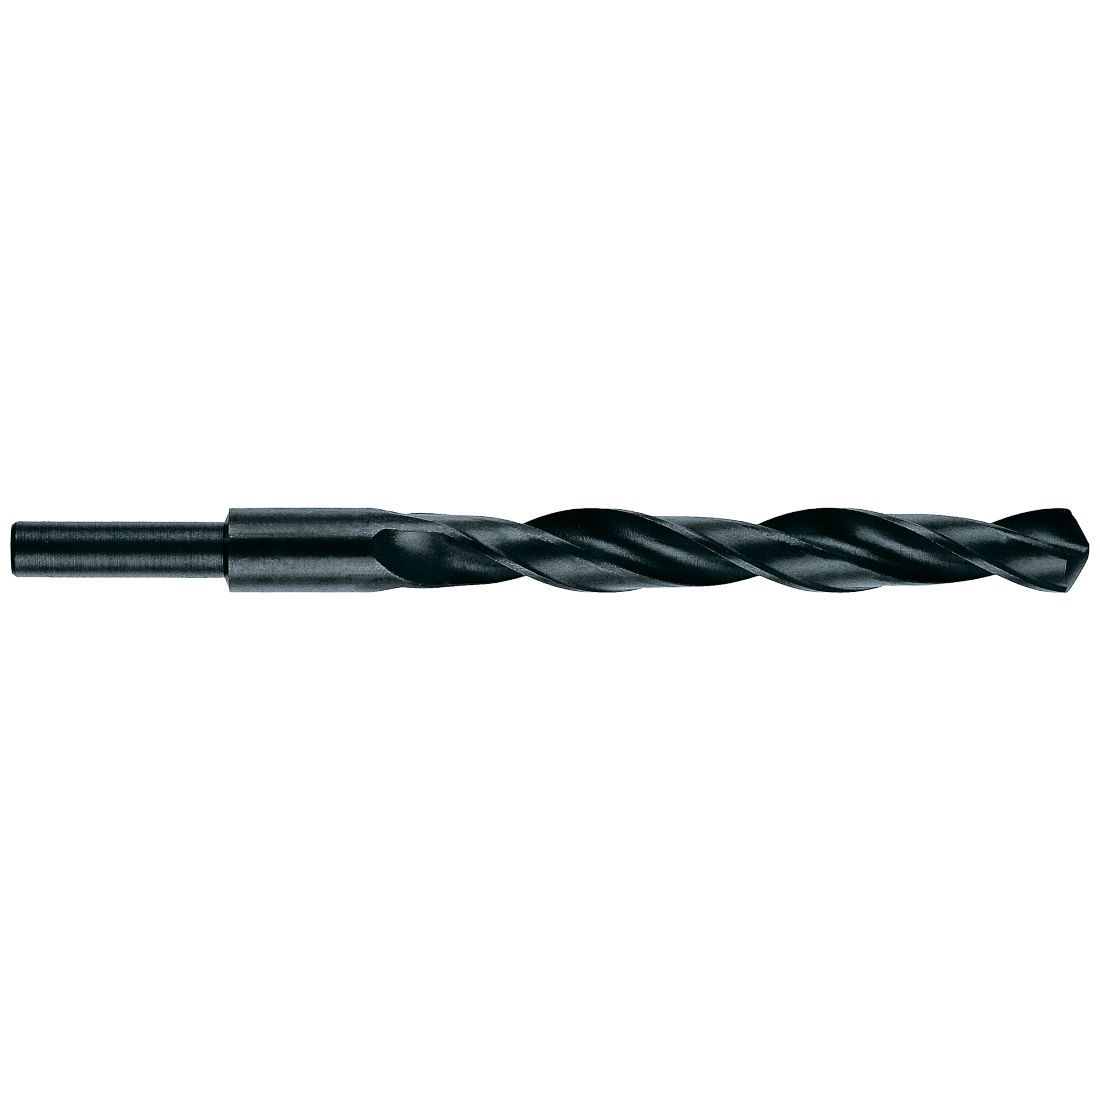 Сверло по металлу Heller HSS cо ступенчатым хвостовиком 17х125х184мм